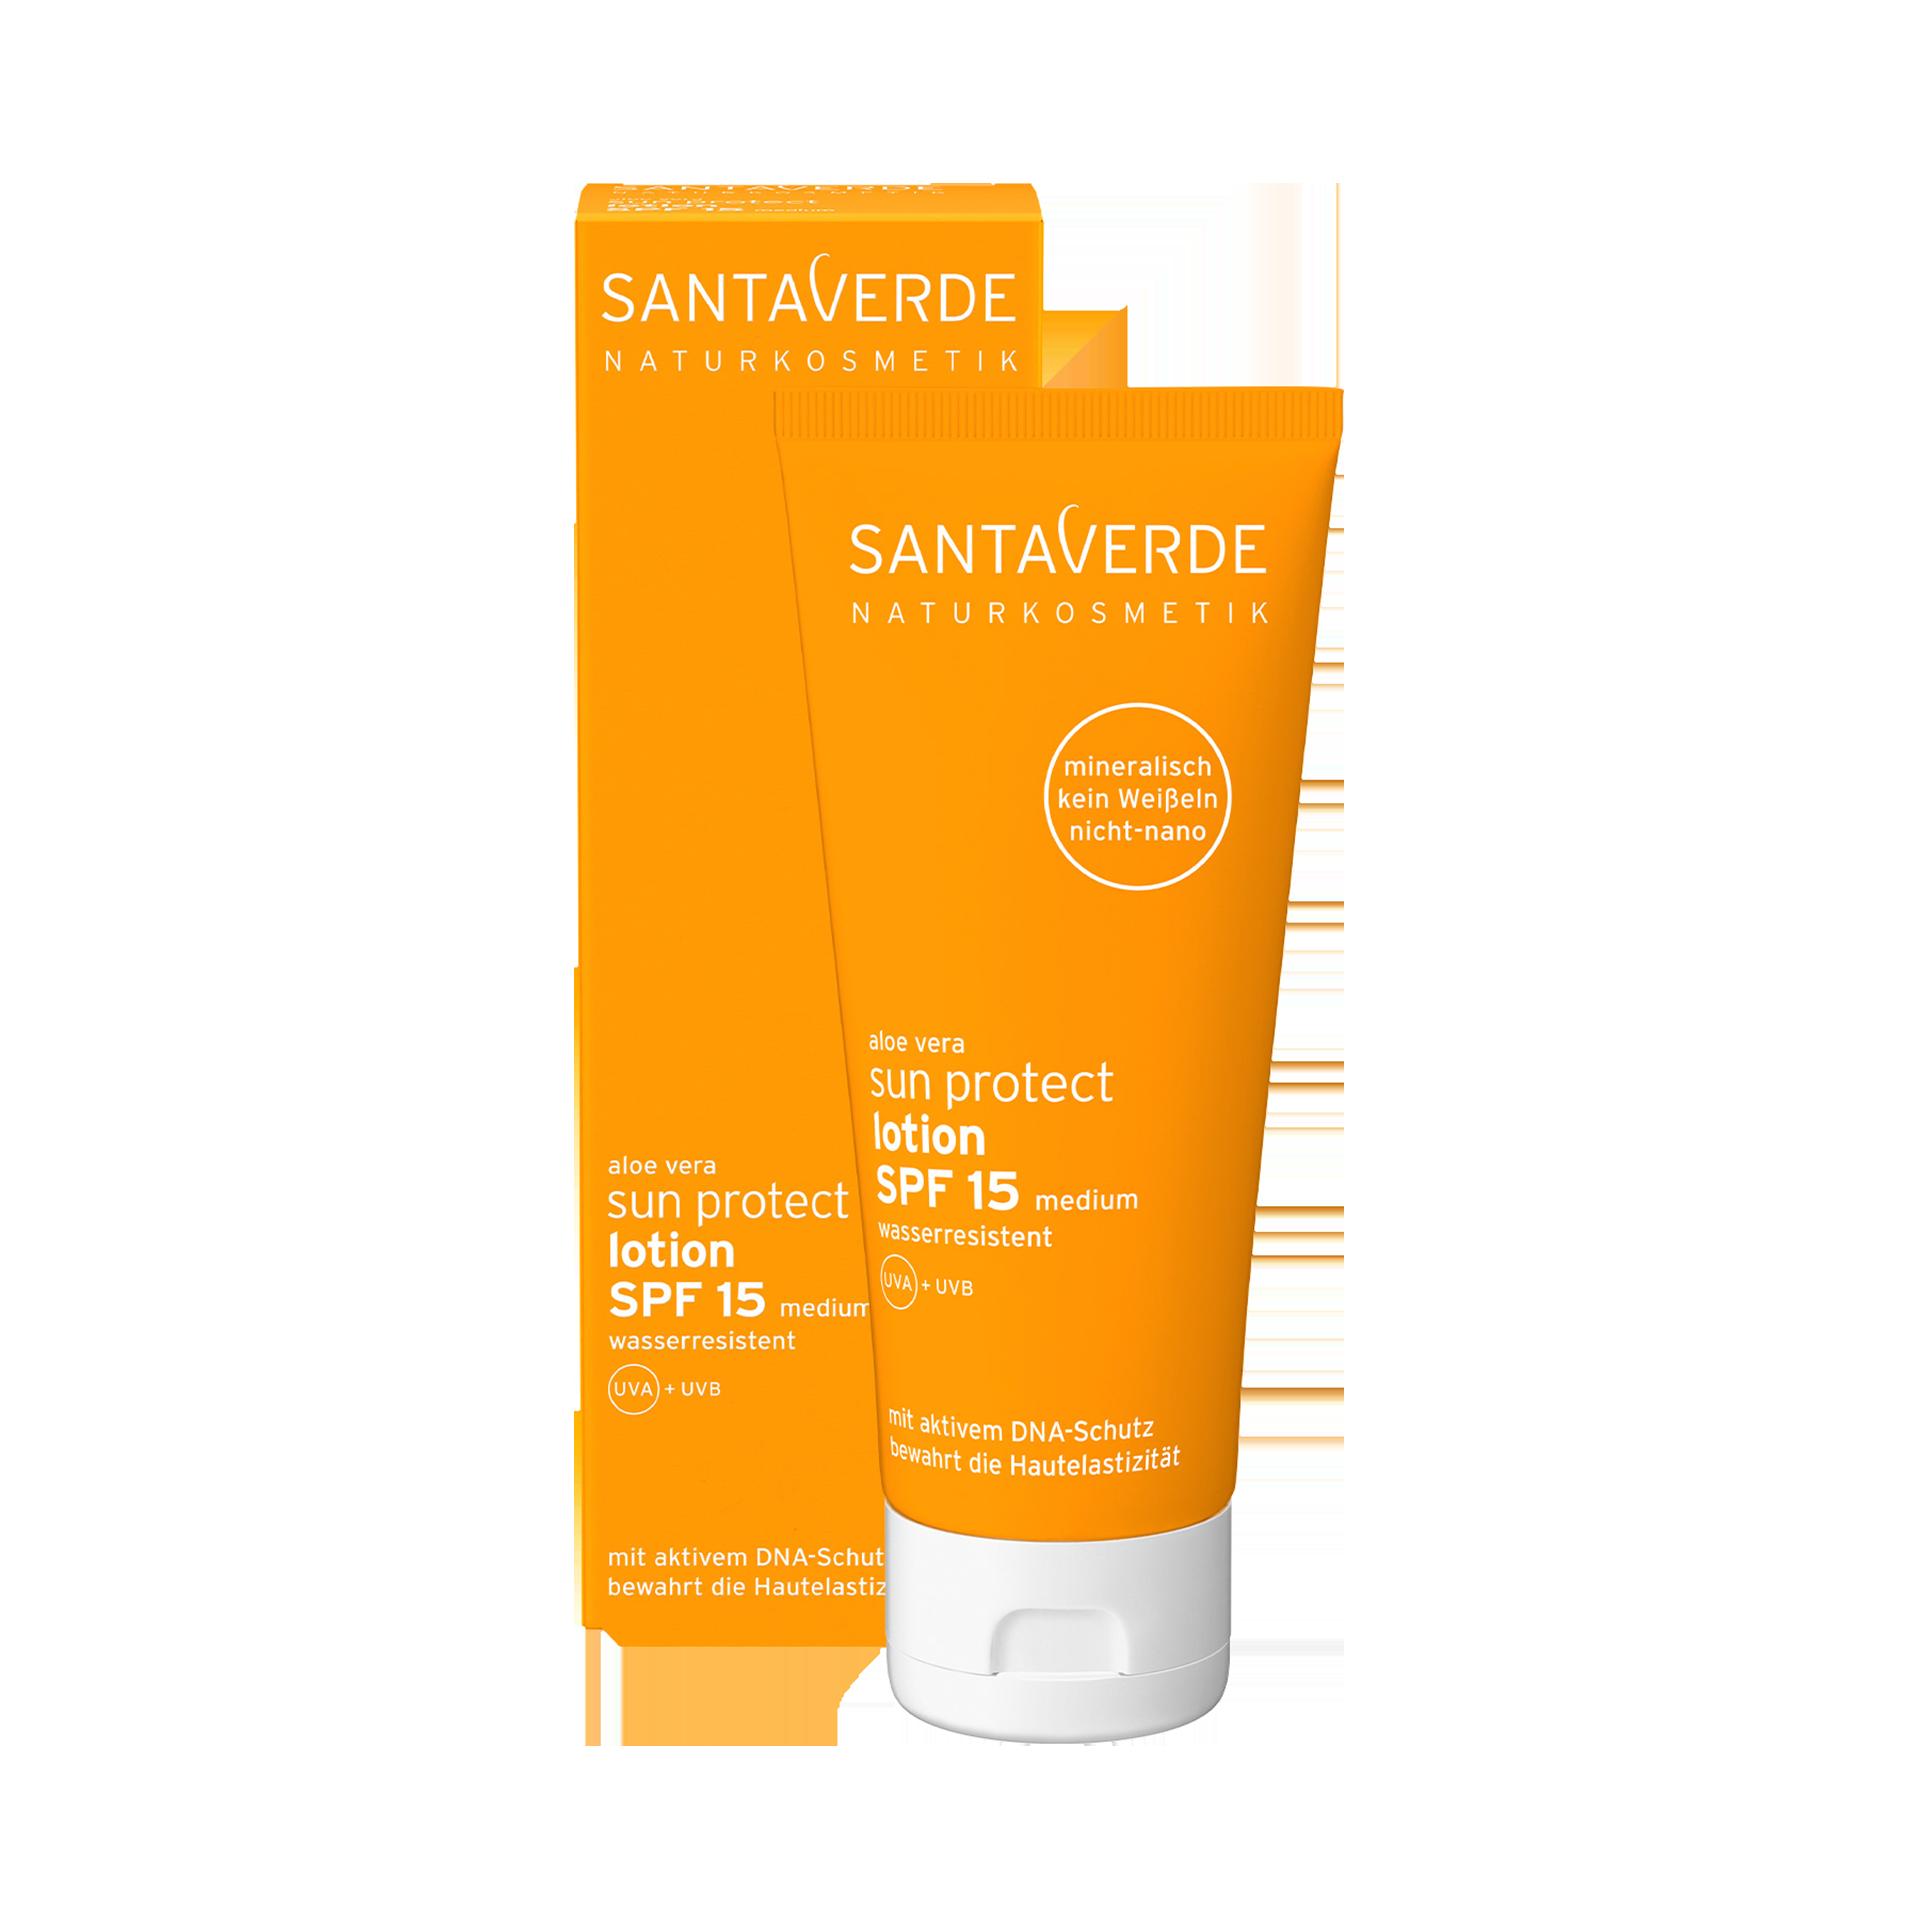 sun protect lotion SPF 15, 100 ml